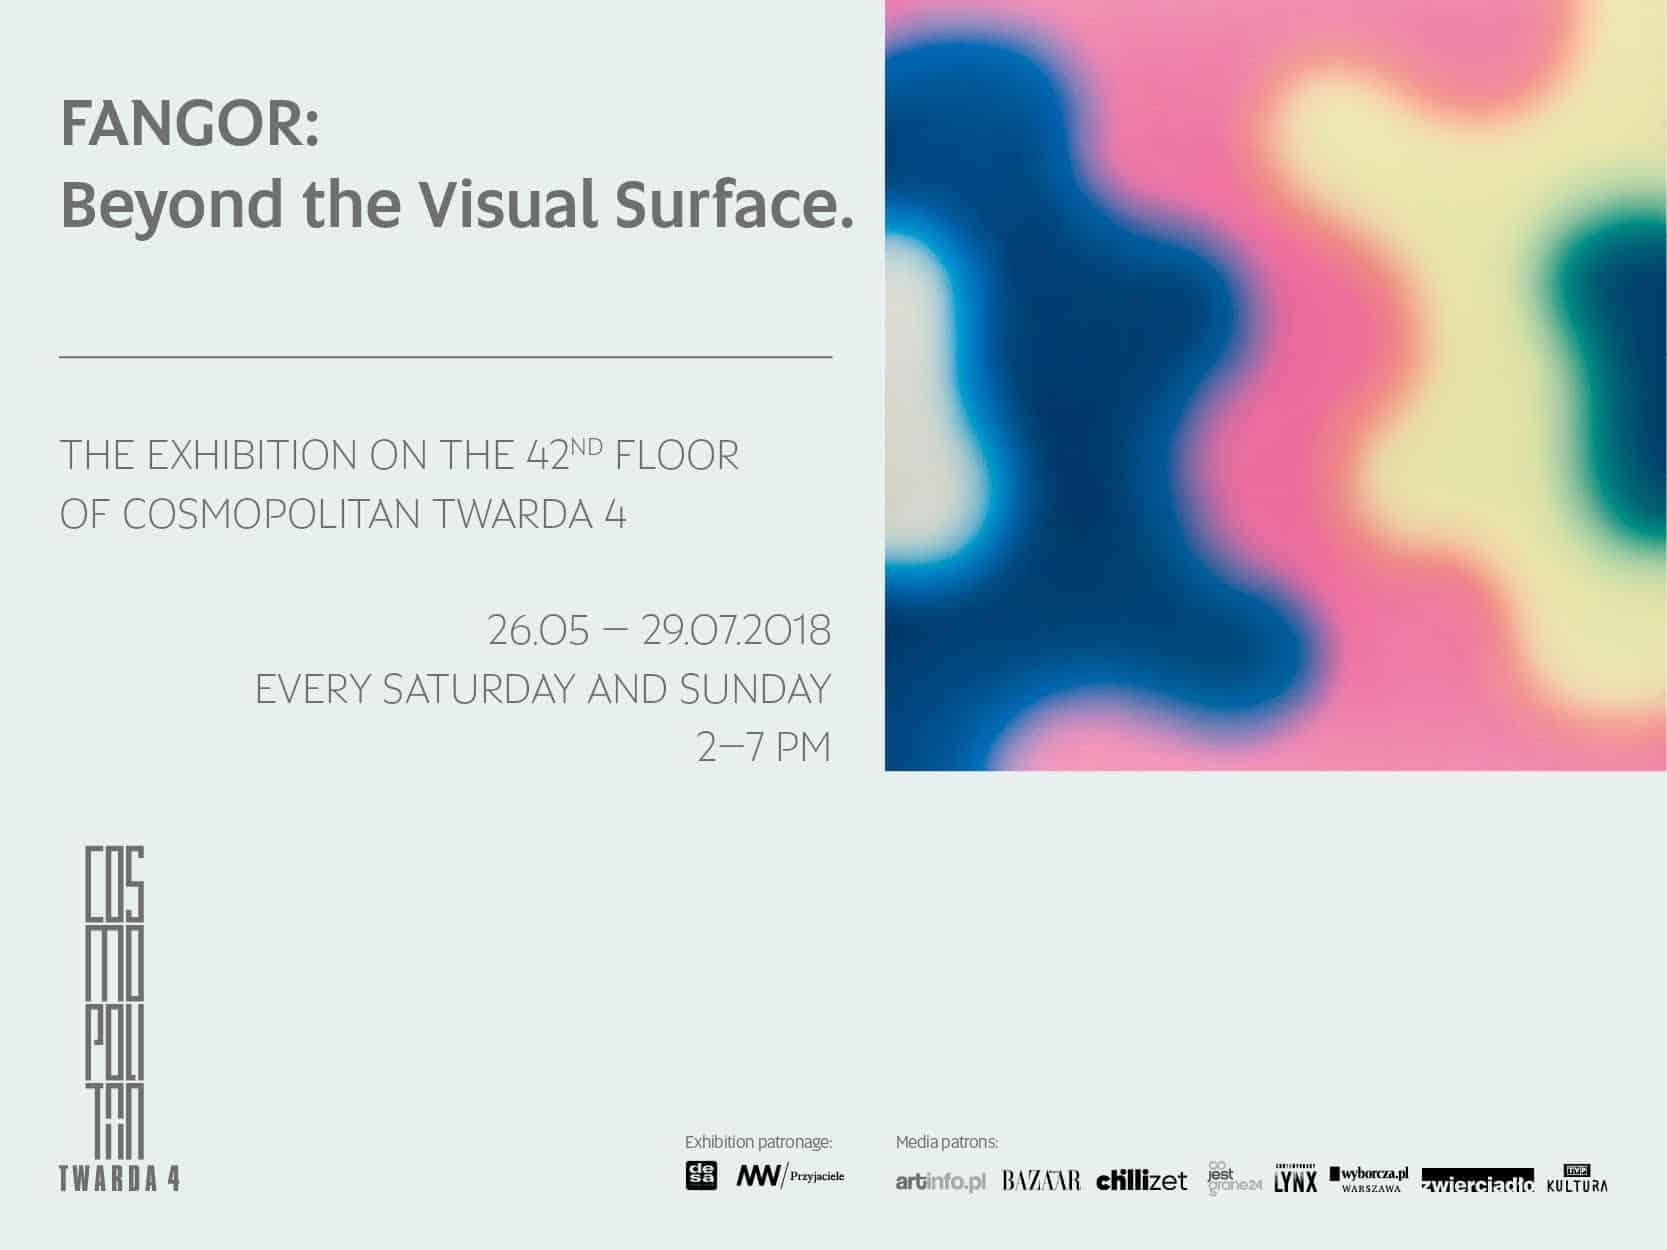 fangor exhibition